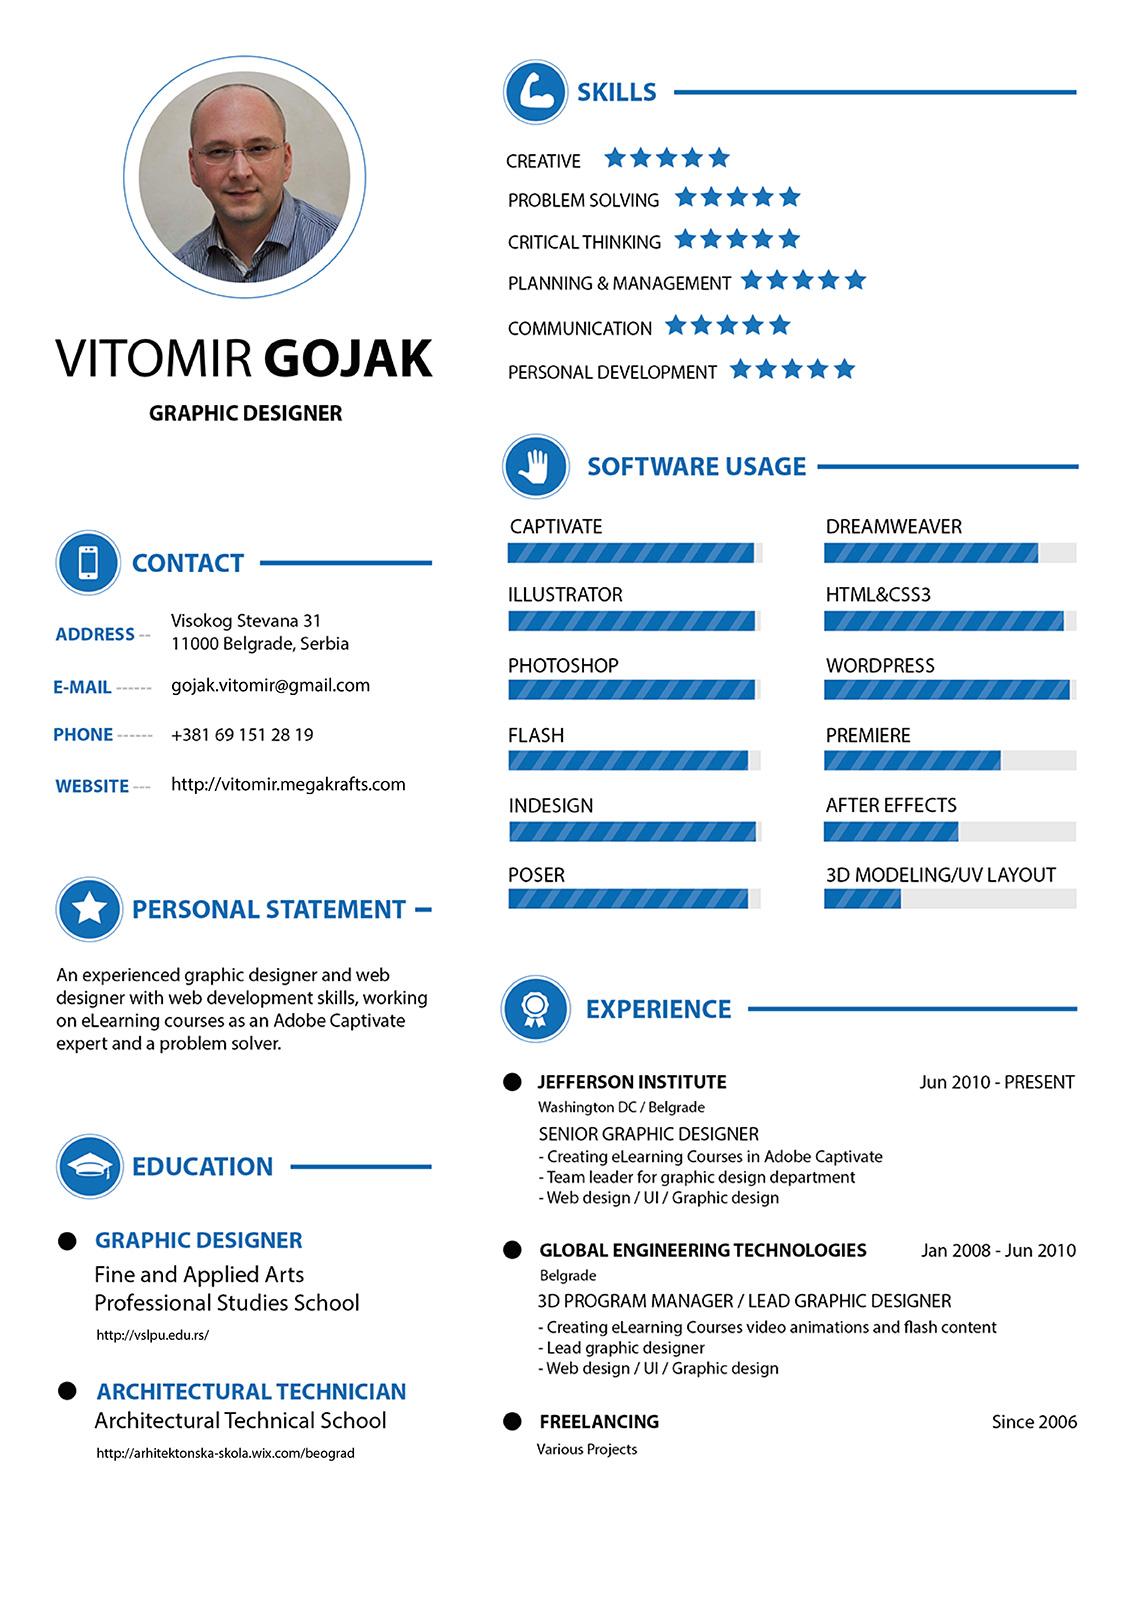 vitomir-gojak-cv-web